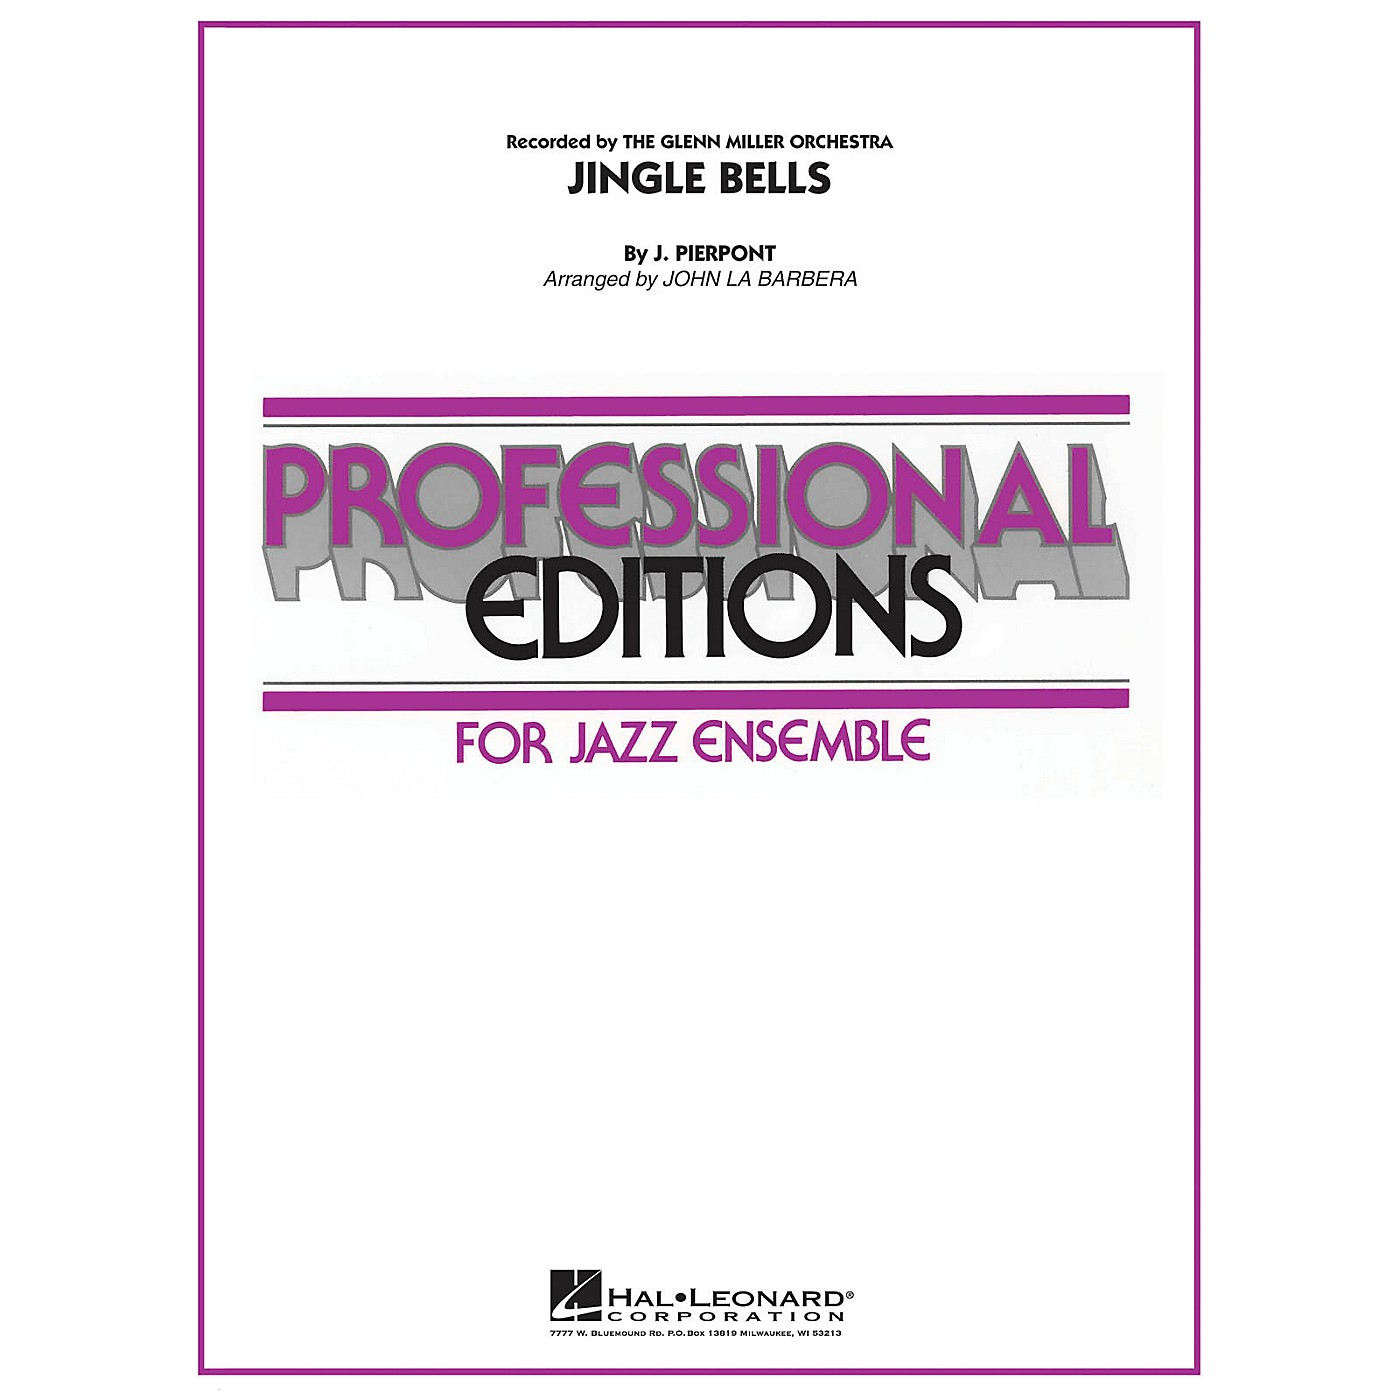 Hal Leonard Jingle Bells (as recorded by The Glenn Miller Orchestra) Jazz Band Level 5 Arranged by John La Barbera thumbnail